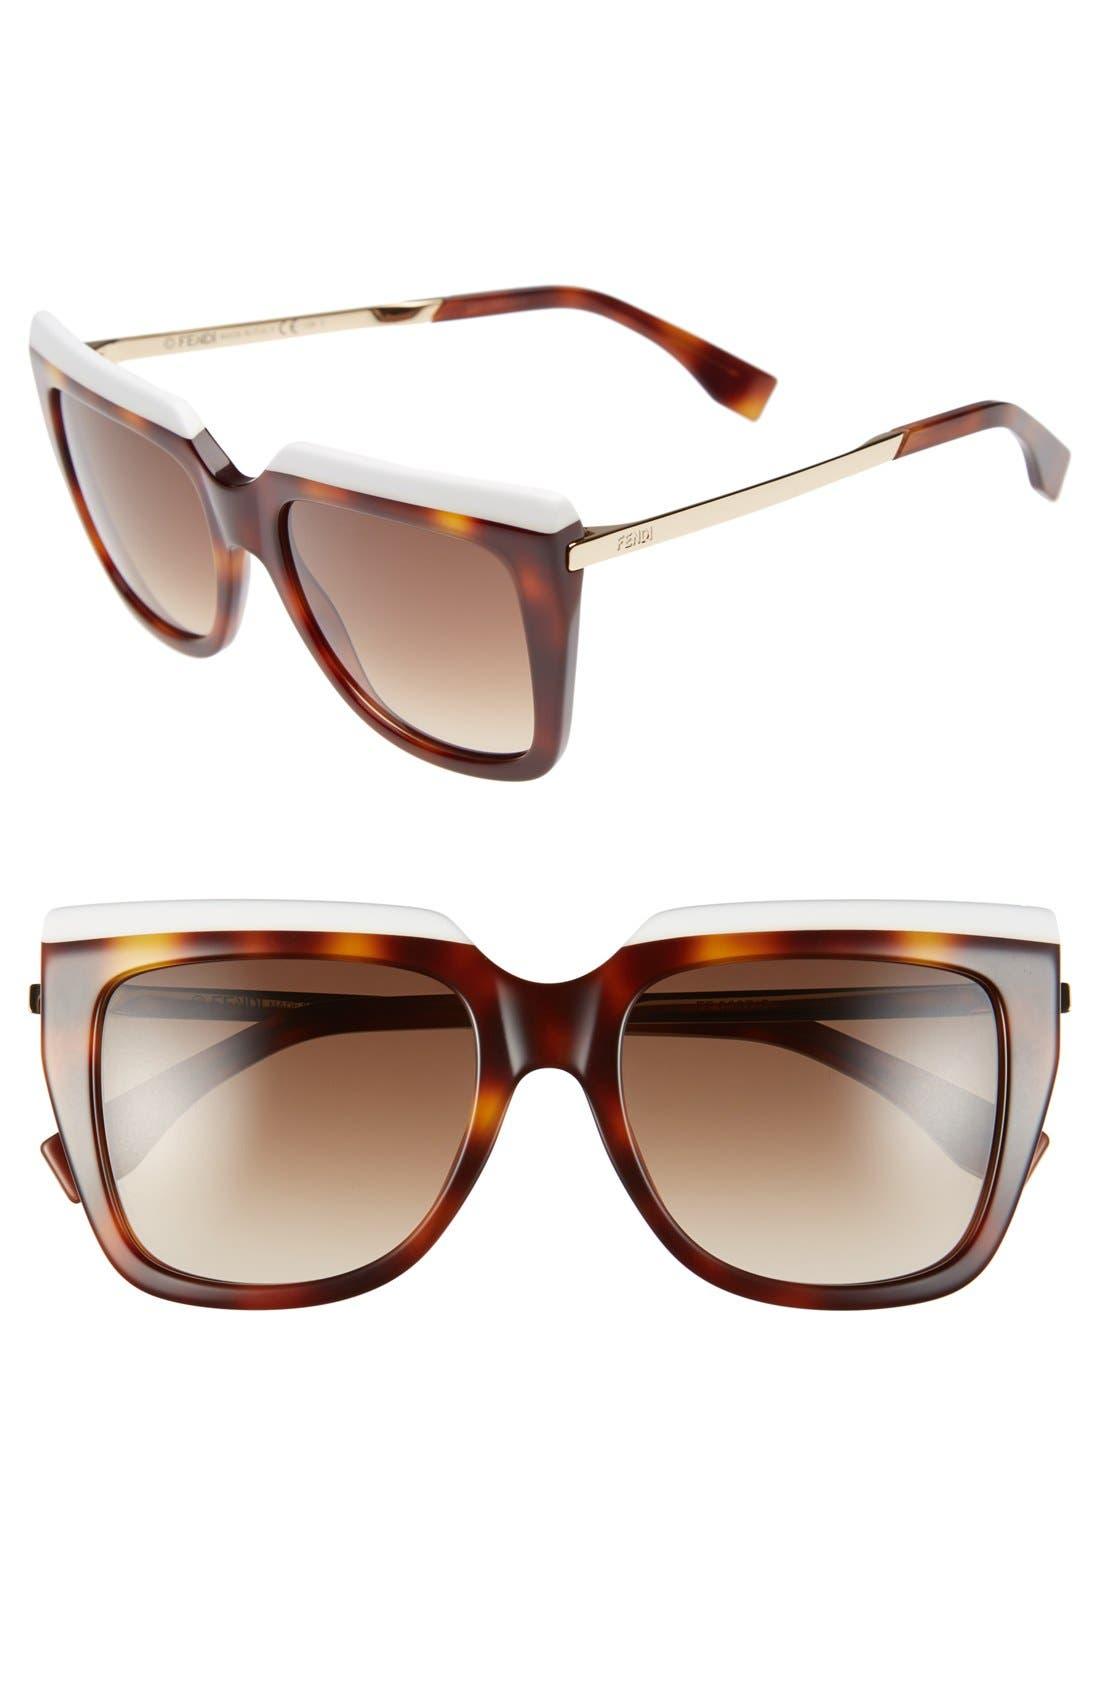 FENDI, 53mm Retro Sunglasses, Main thumbnail 1, color, 100